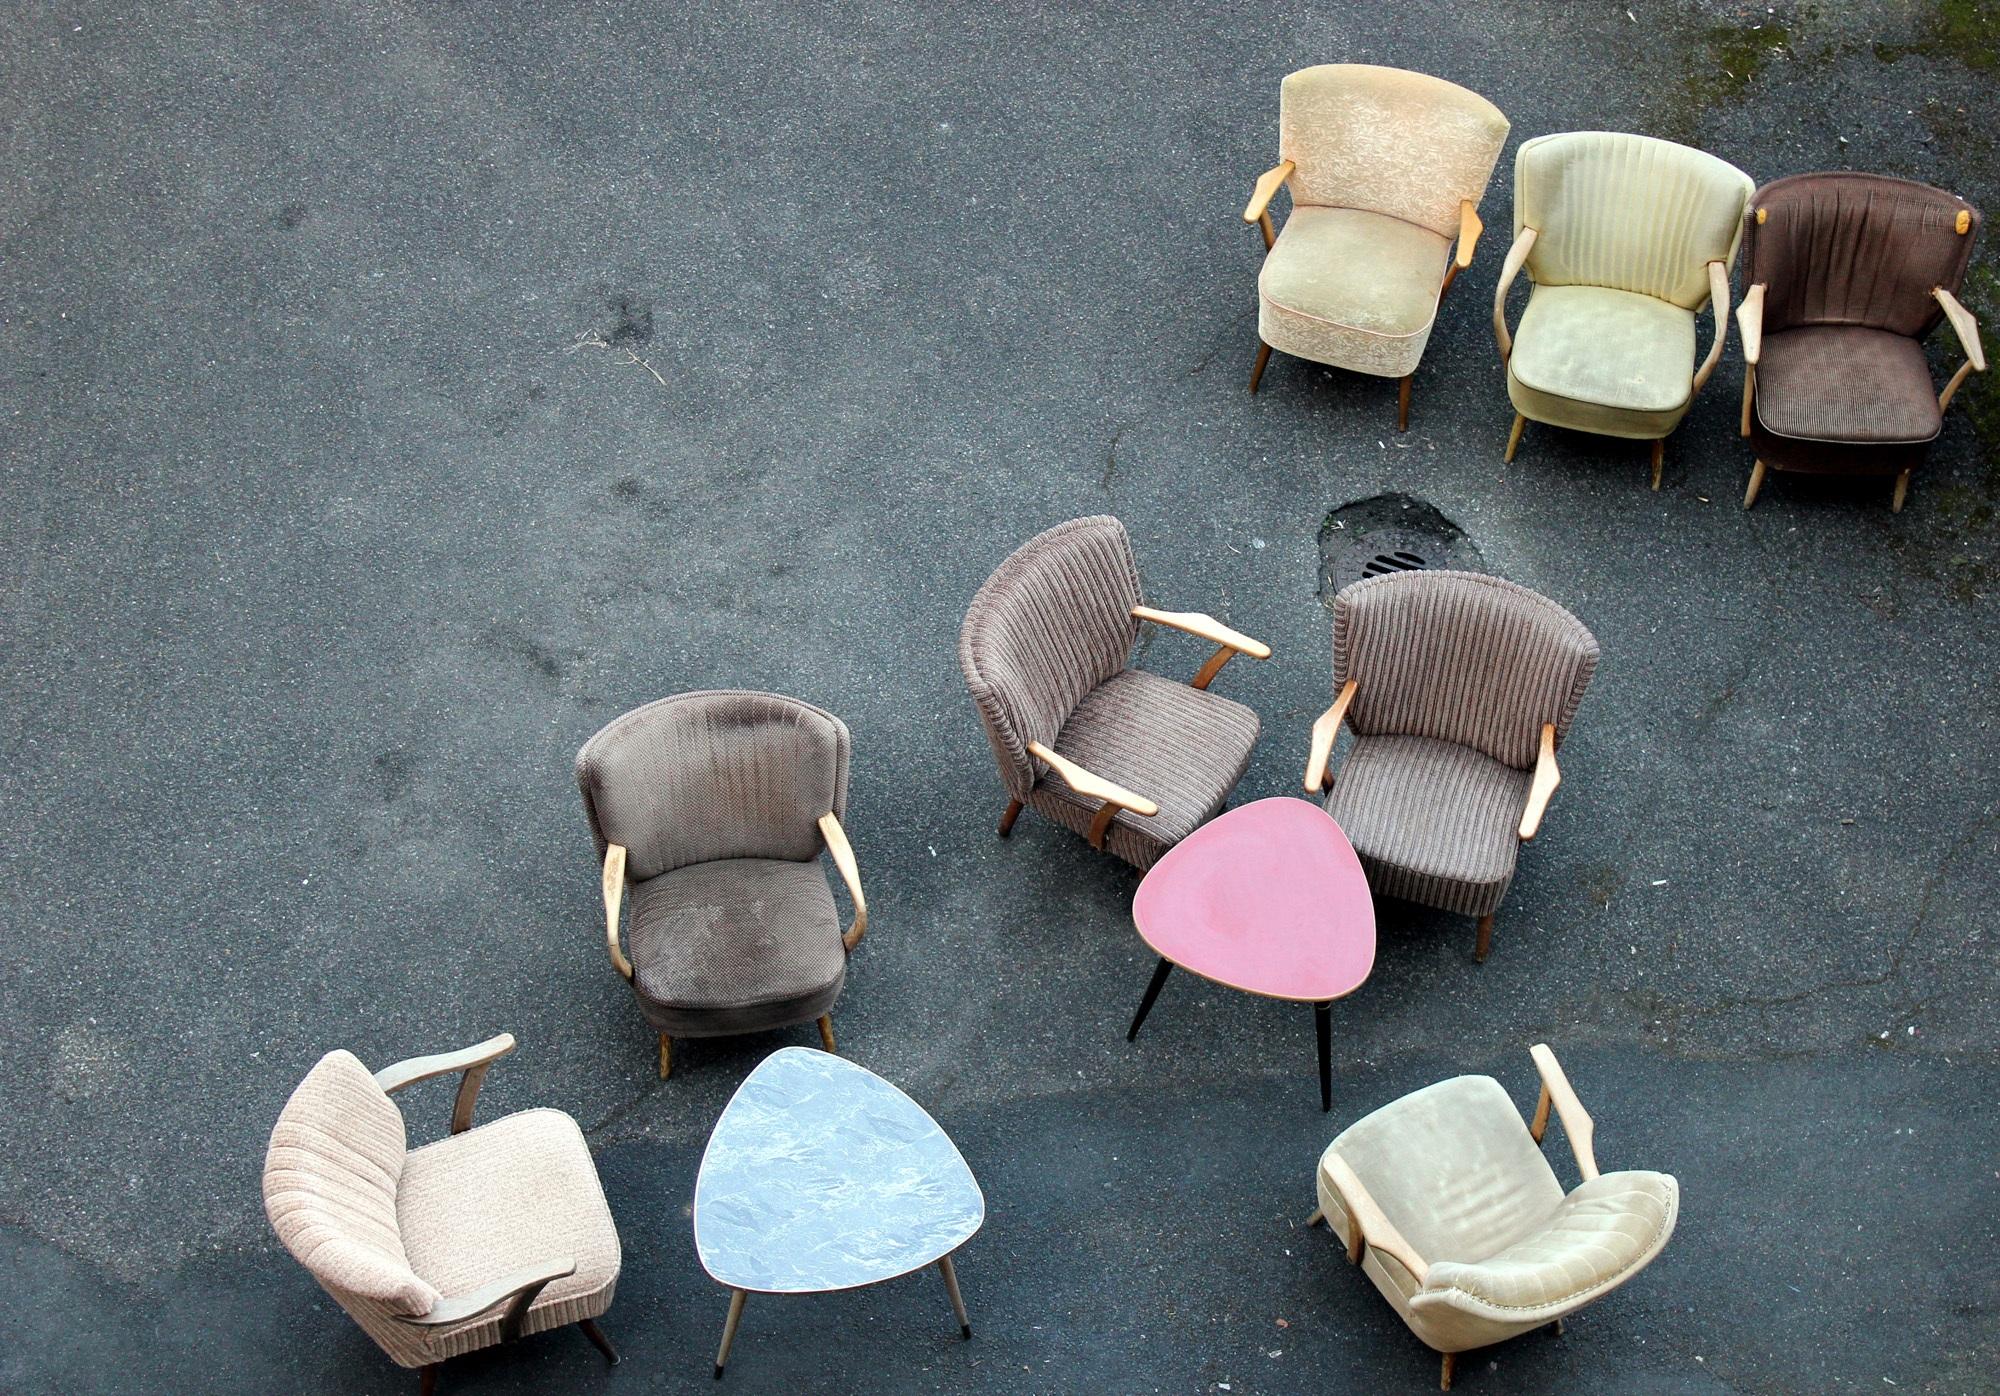 Fotos gratis : mano, mesa, zapato, grupo, madera, vendimia, Retro ...